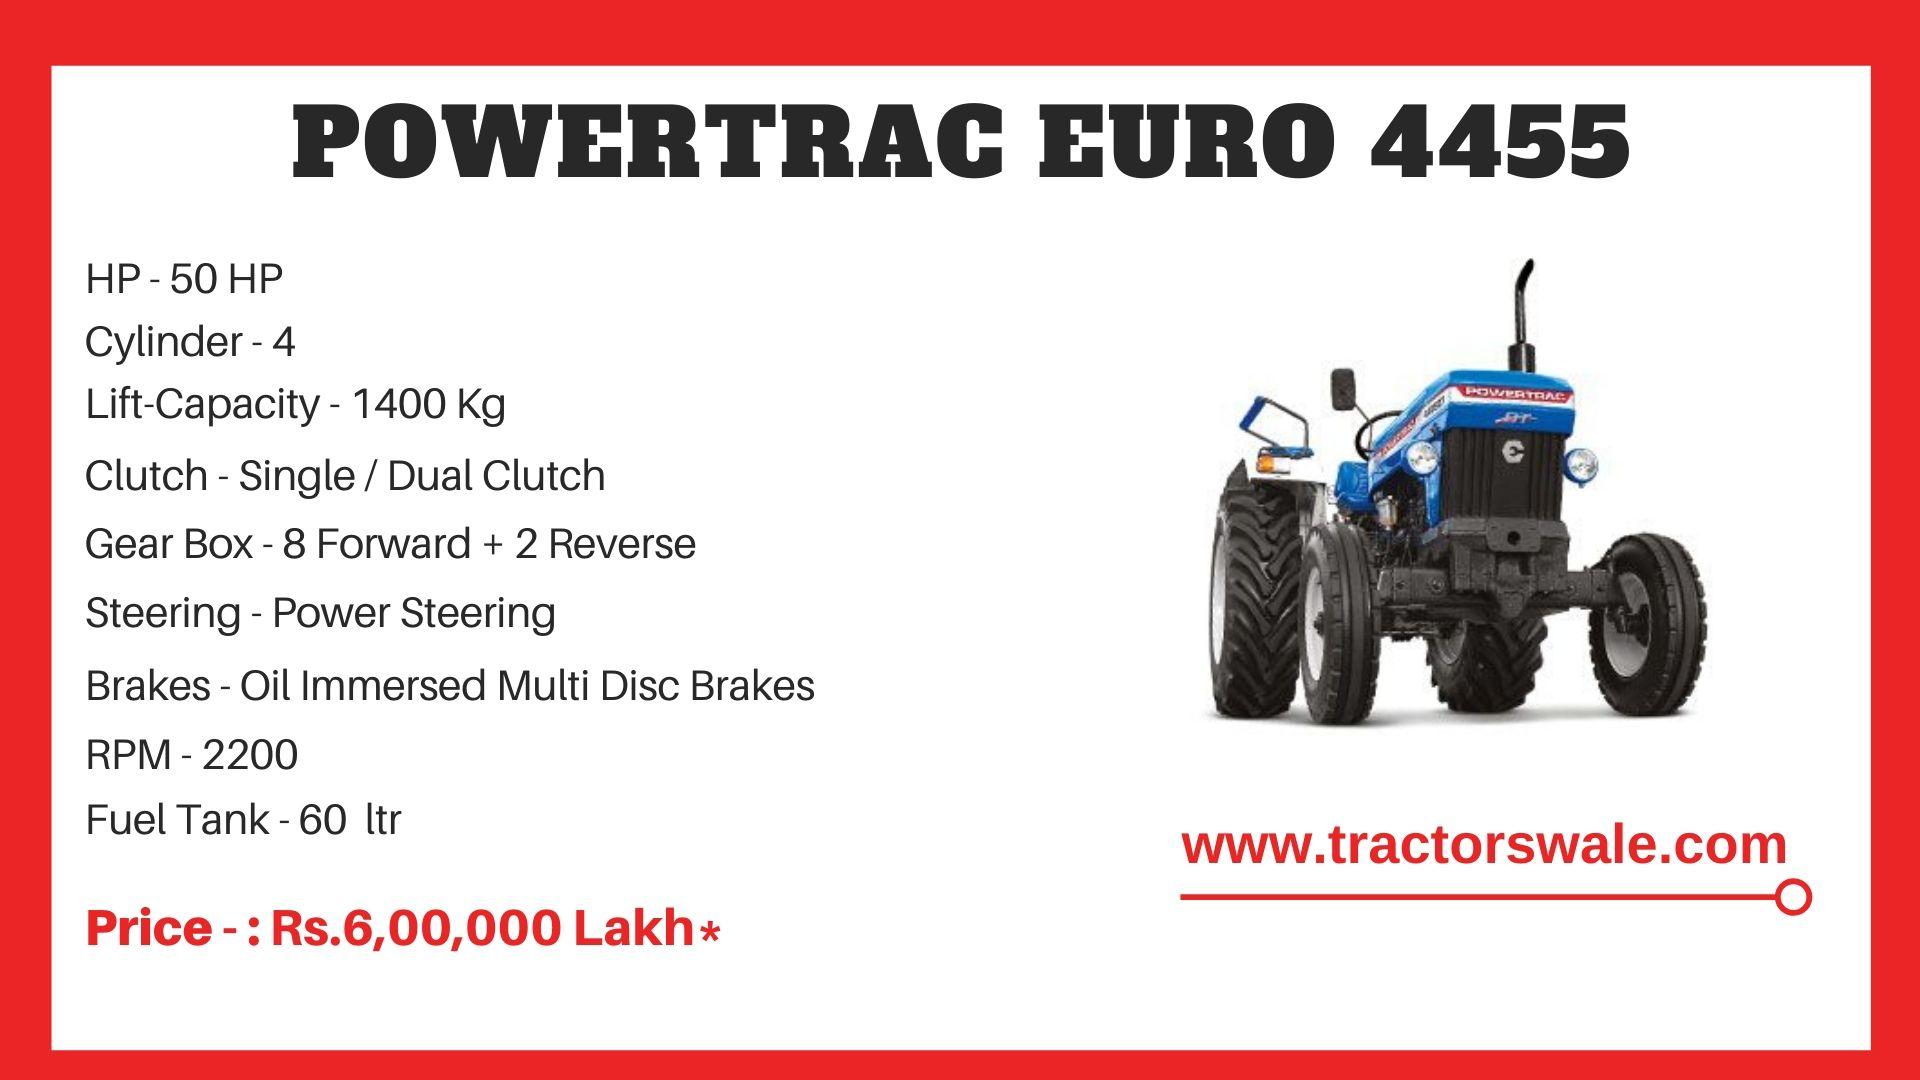 PowerTrac Euro 4455 tractor Price